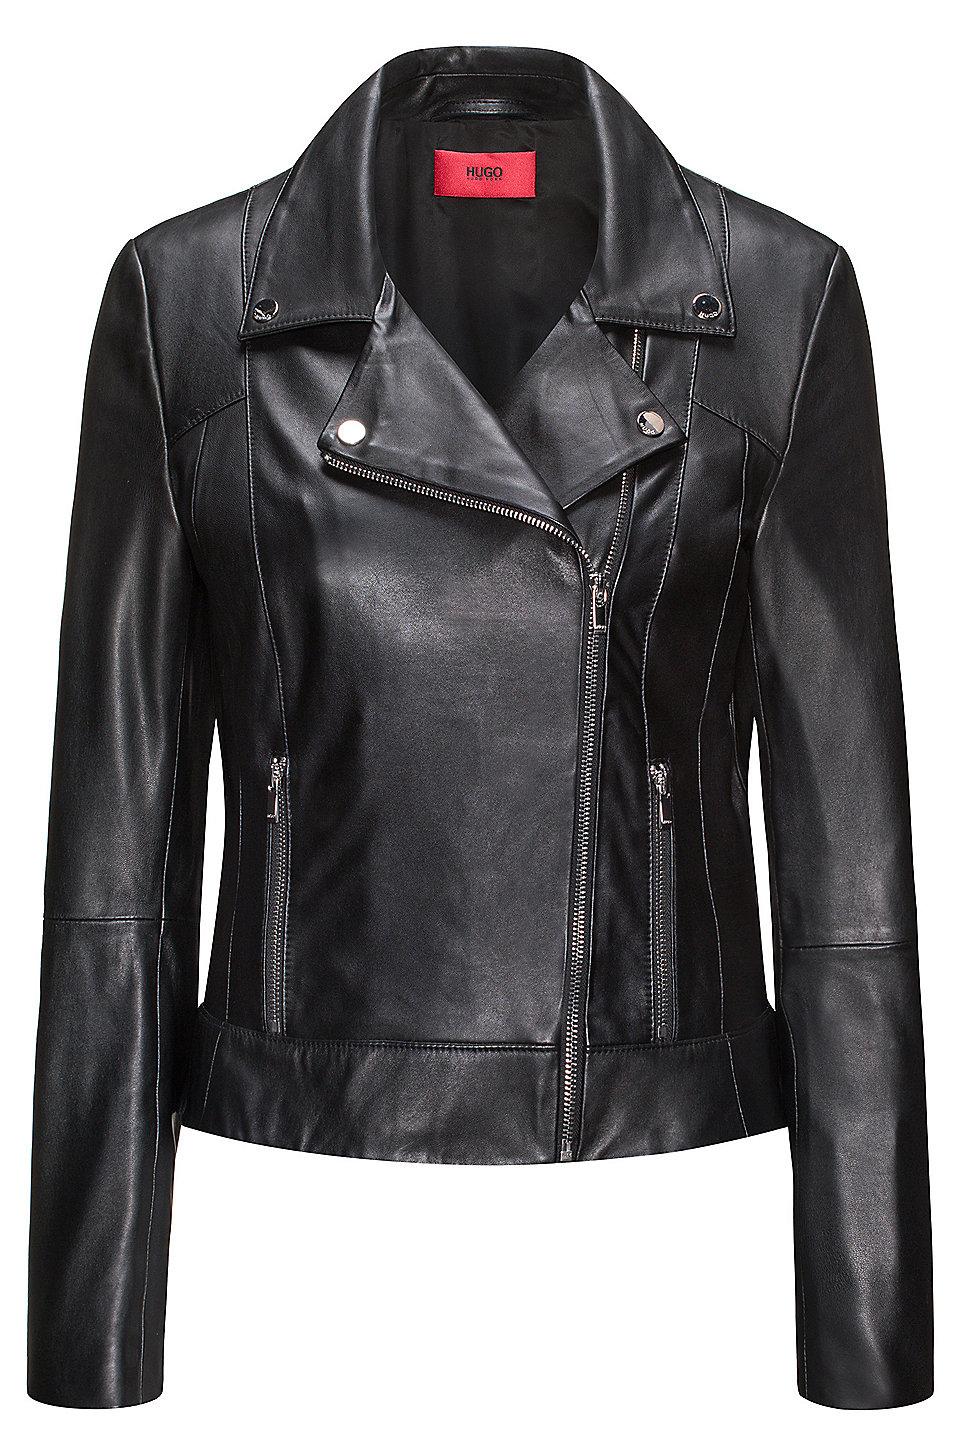 Hugo boss women's leather jacket australia